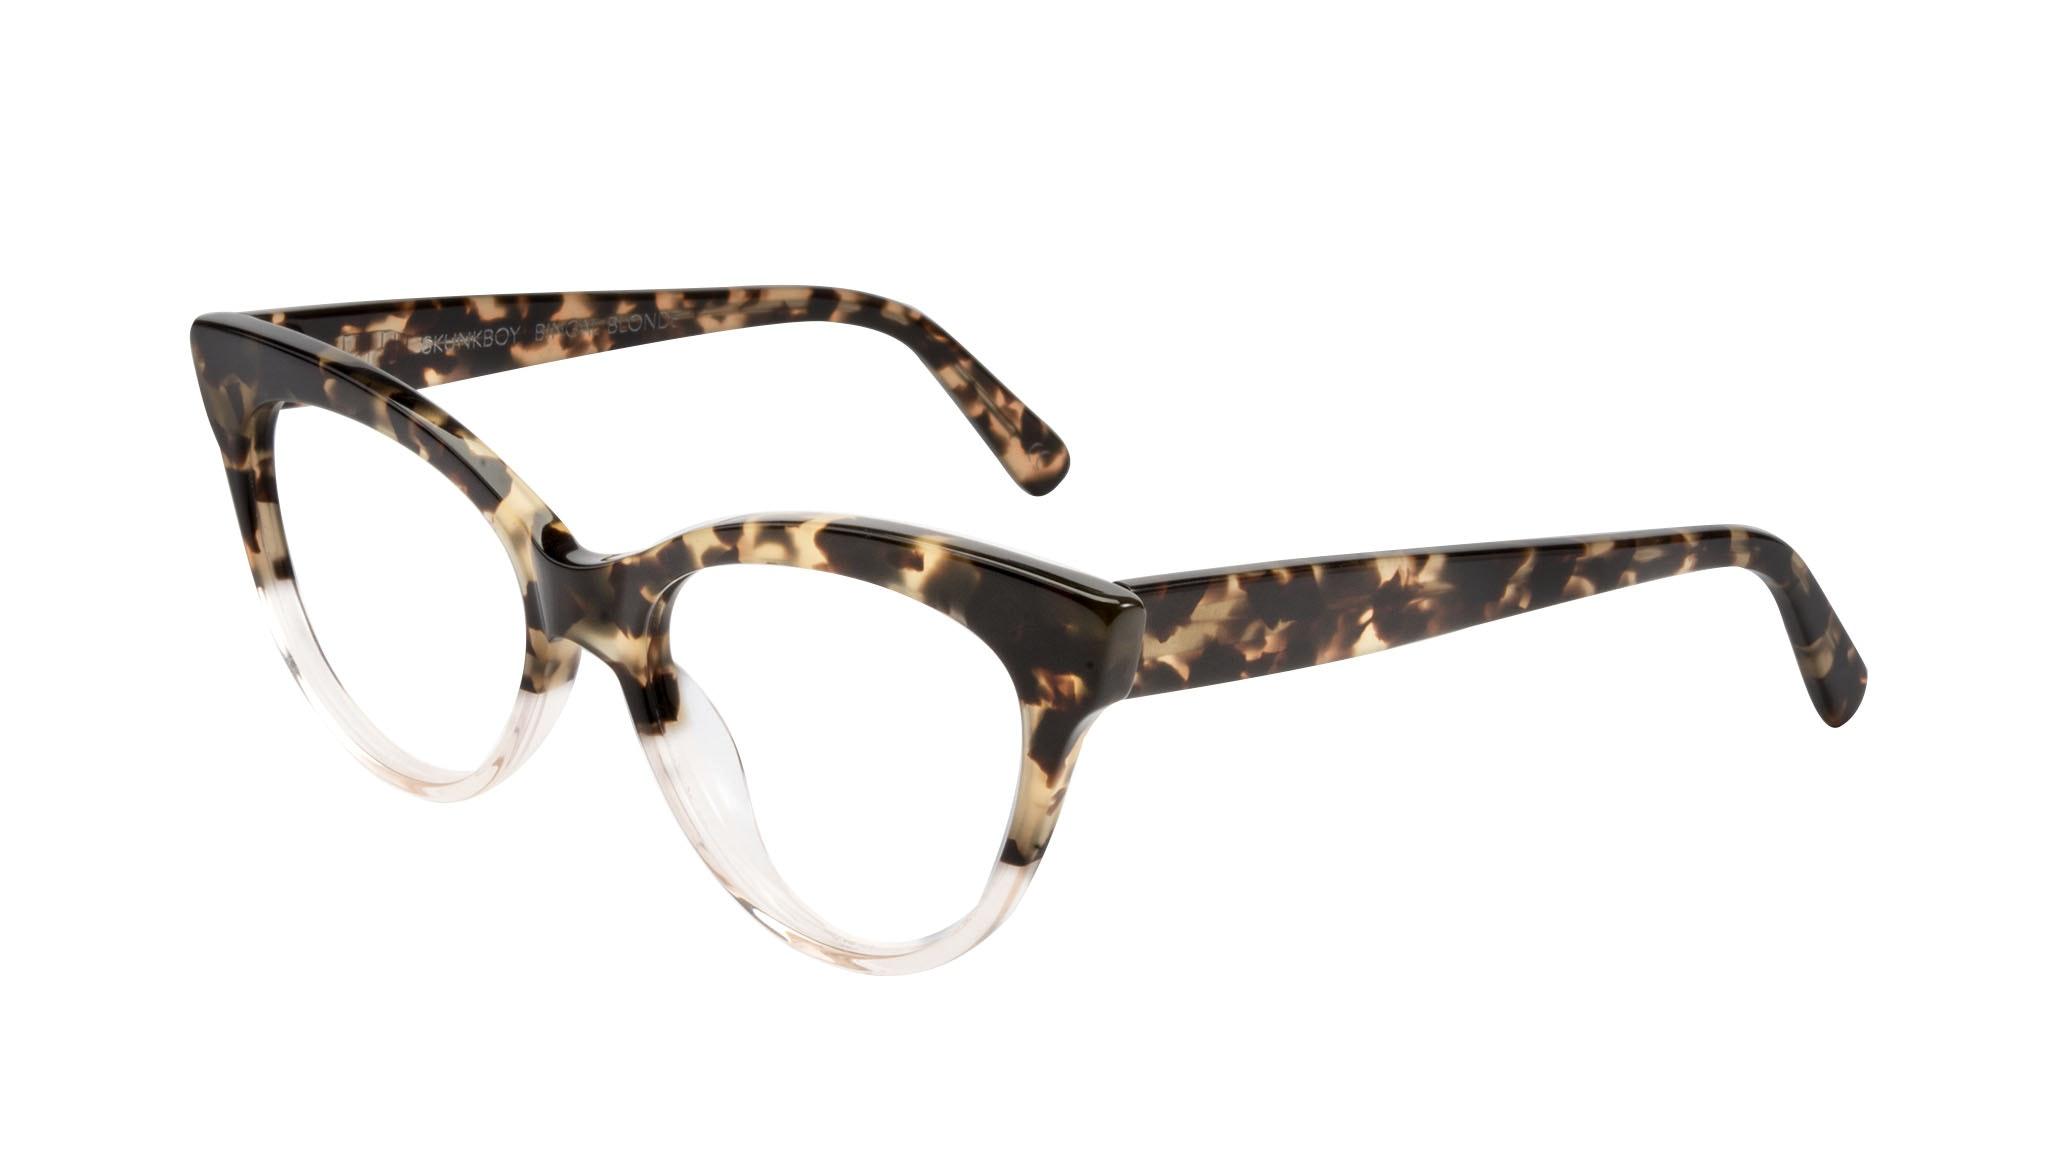 Affordable Fashion Glasses Cat Eye Eyeglasses Women SkunkBoy Champagne Tort Tilt